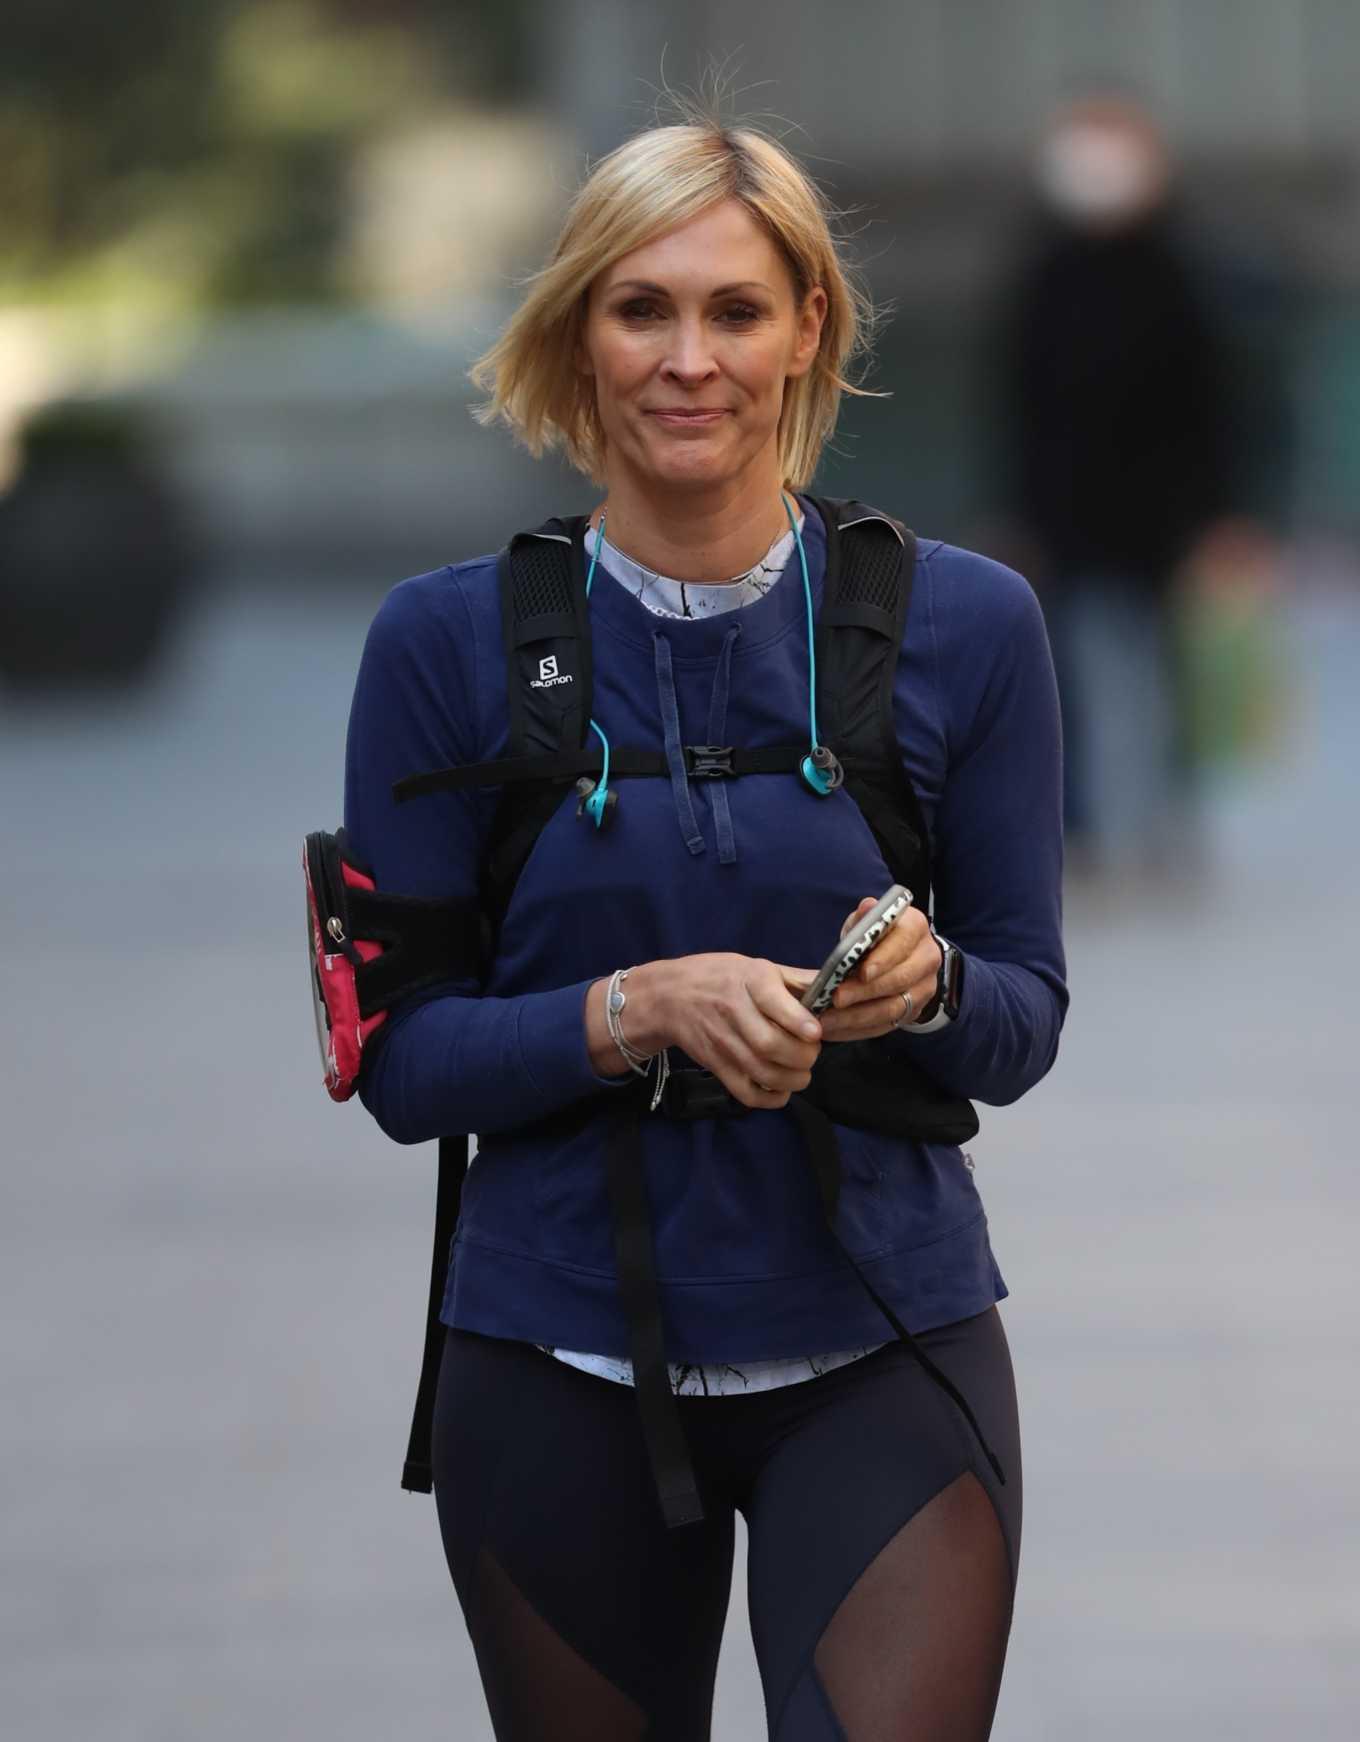 Jenni Falconer 2020 : Jenni Falconer in Tights – Goes for jog in London-12